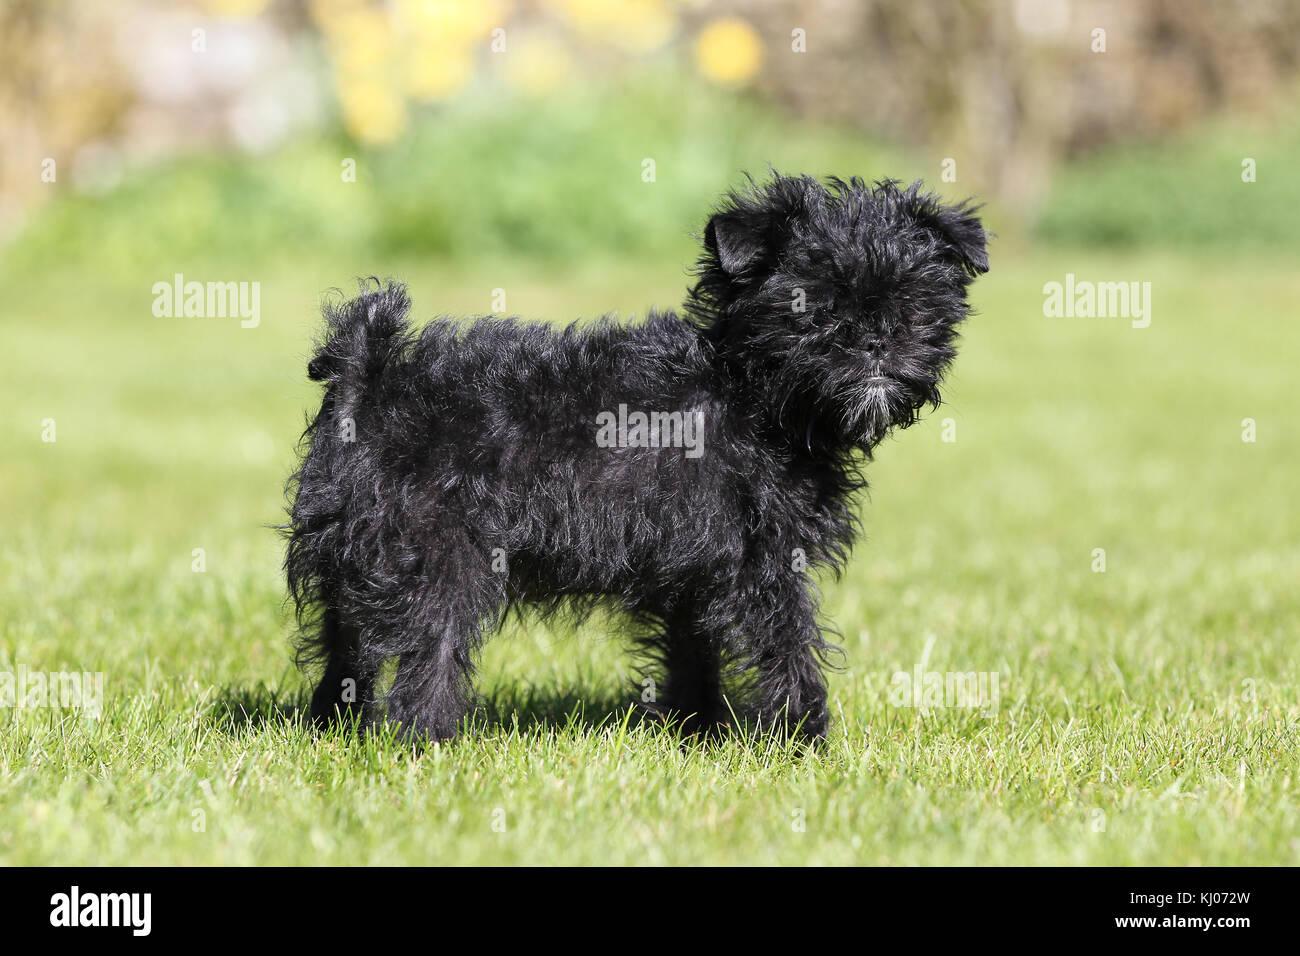 Affenpinscher Puppy Stock Photo 165962689 Alamy